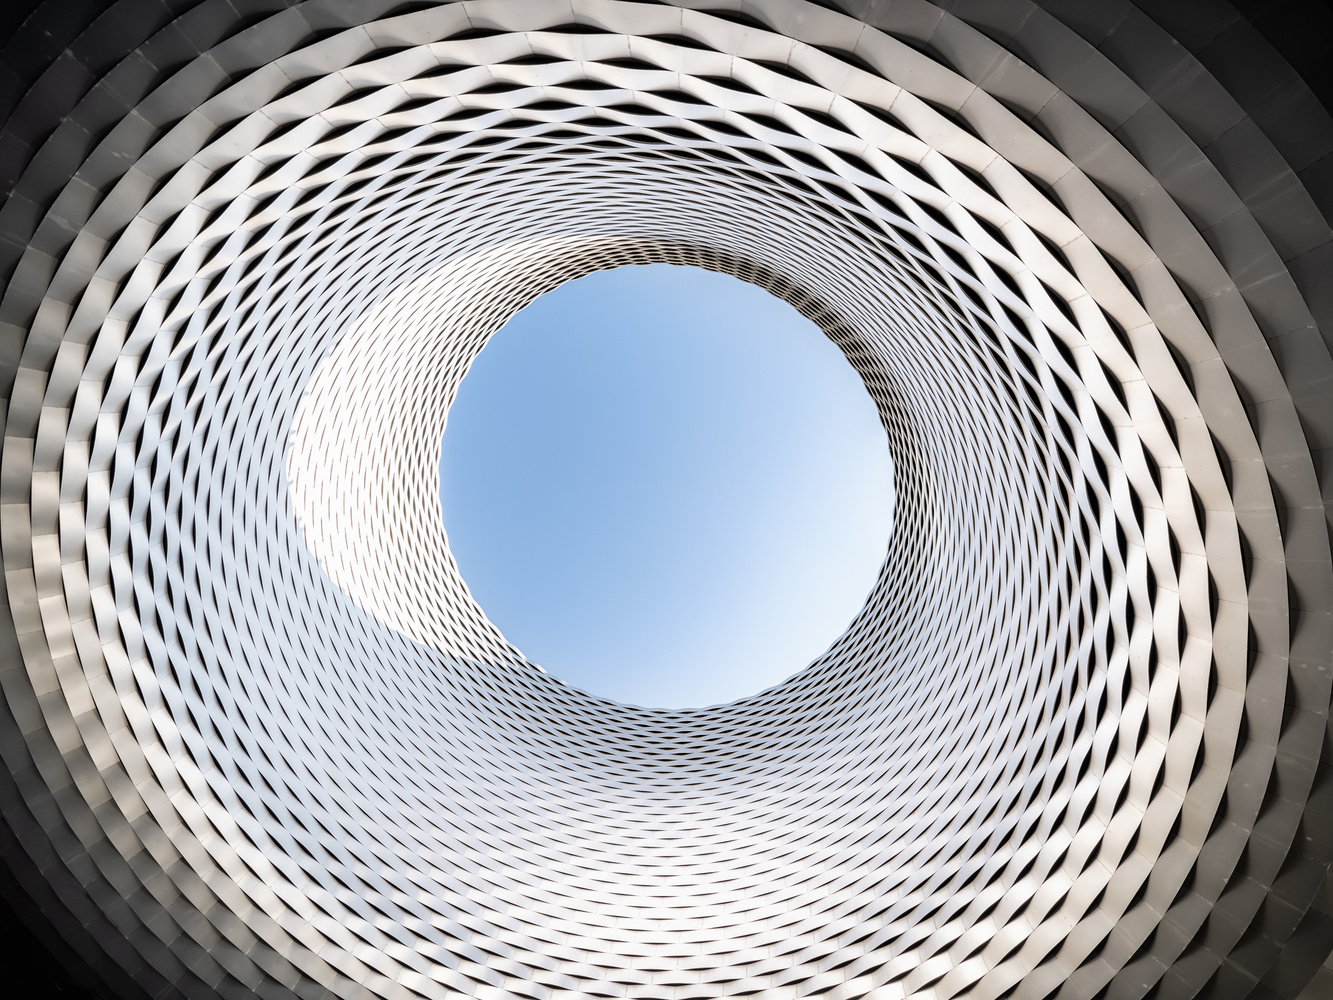 Messe Basel | Oculus by Sebastian Grundgeir